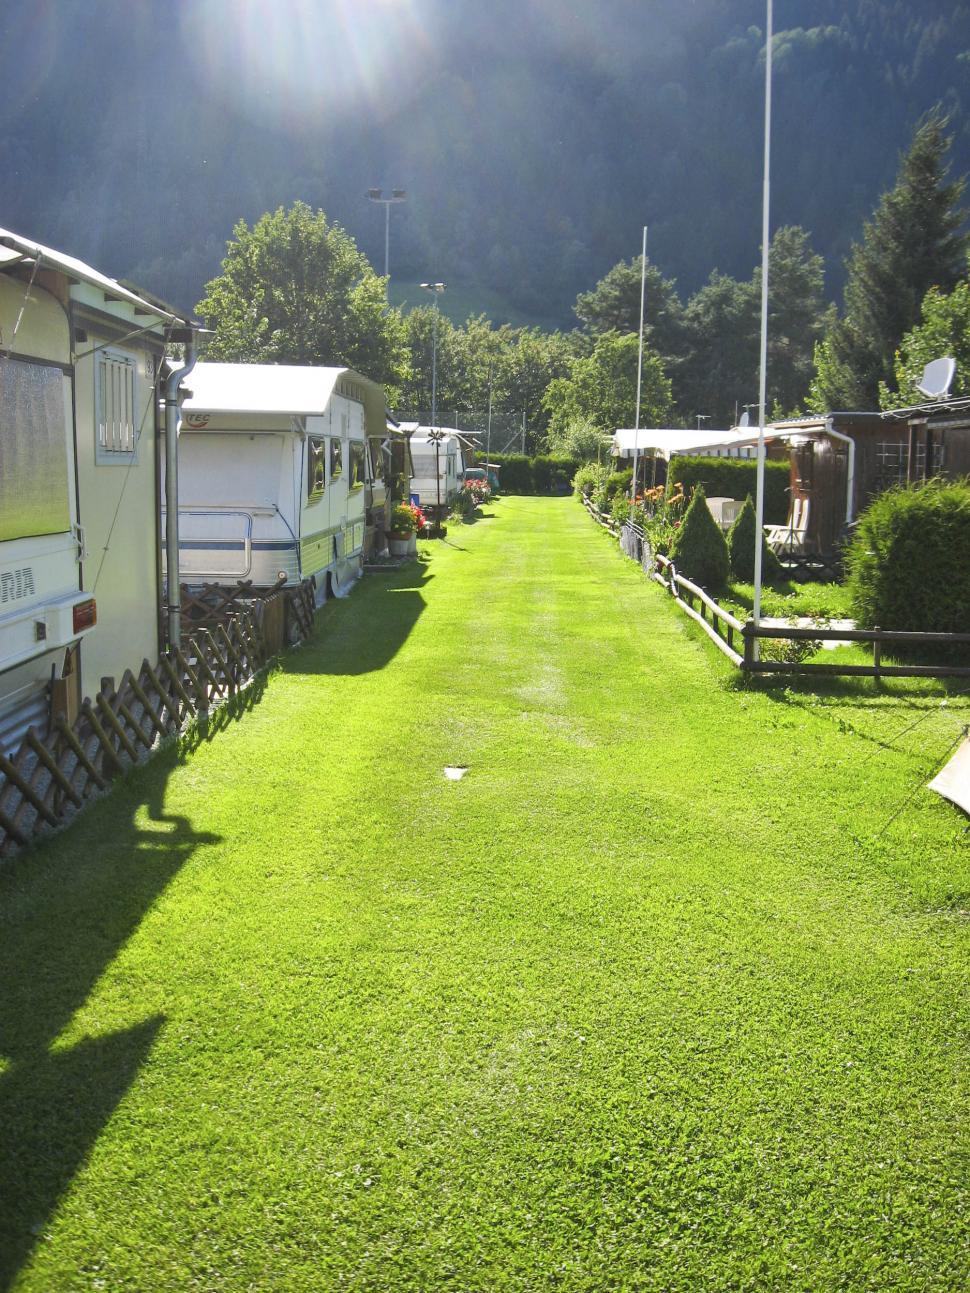 Download Free Stock HD Photo of alpine trailer park Online